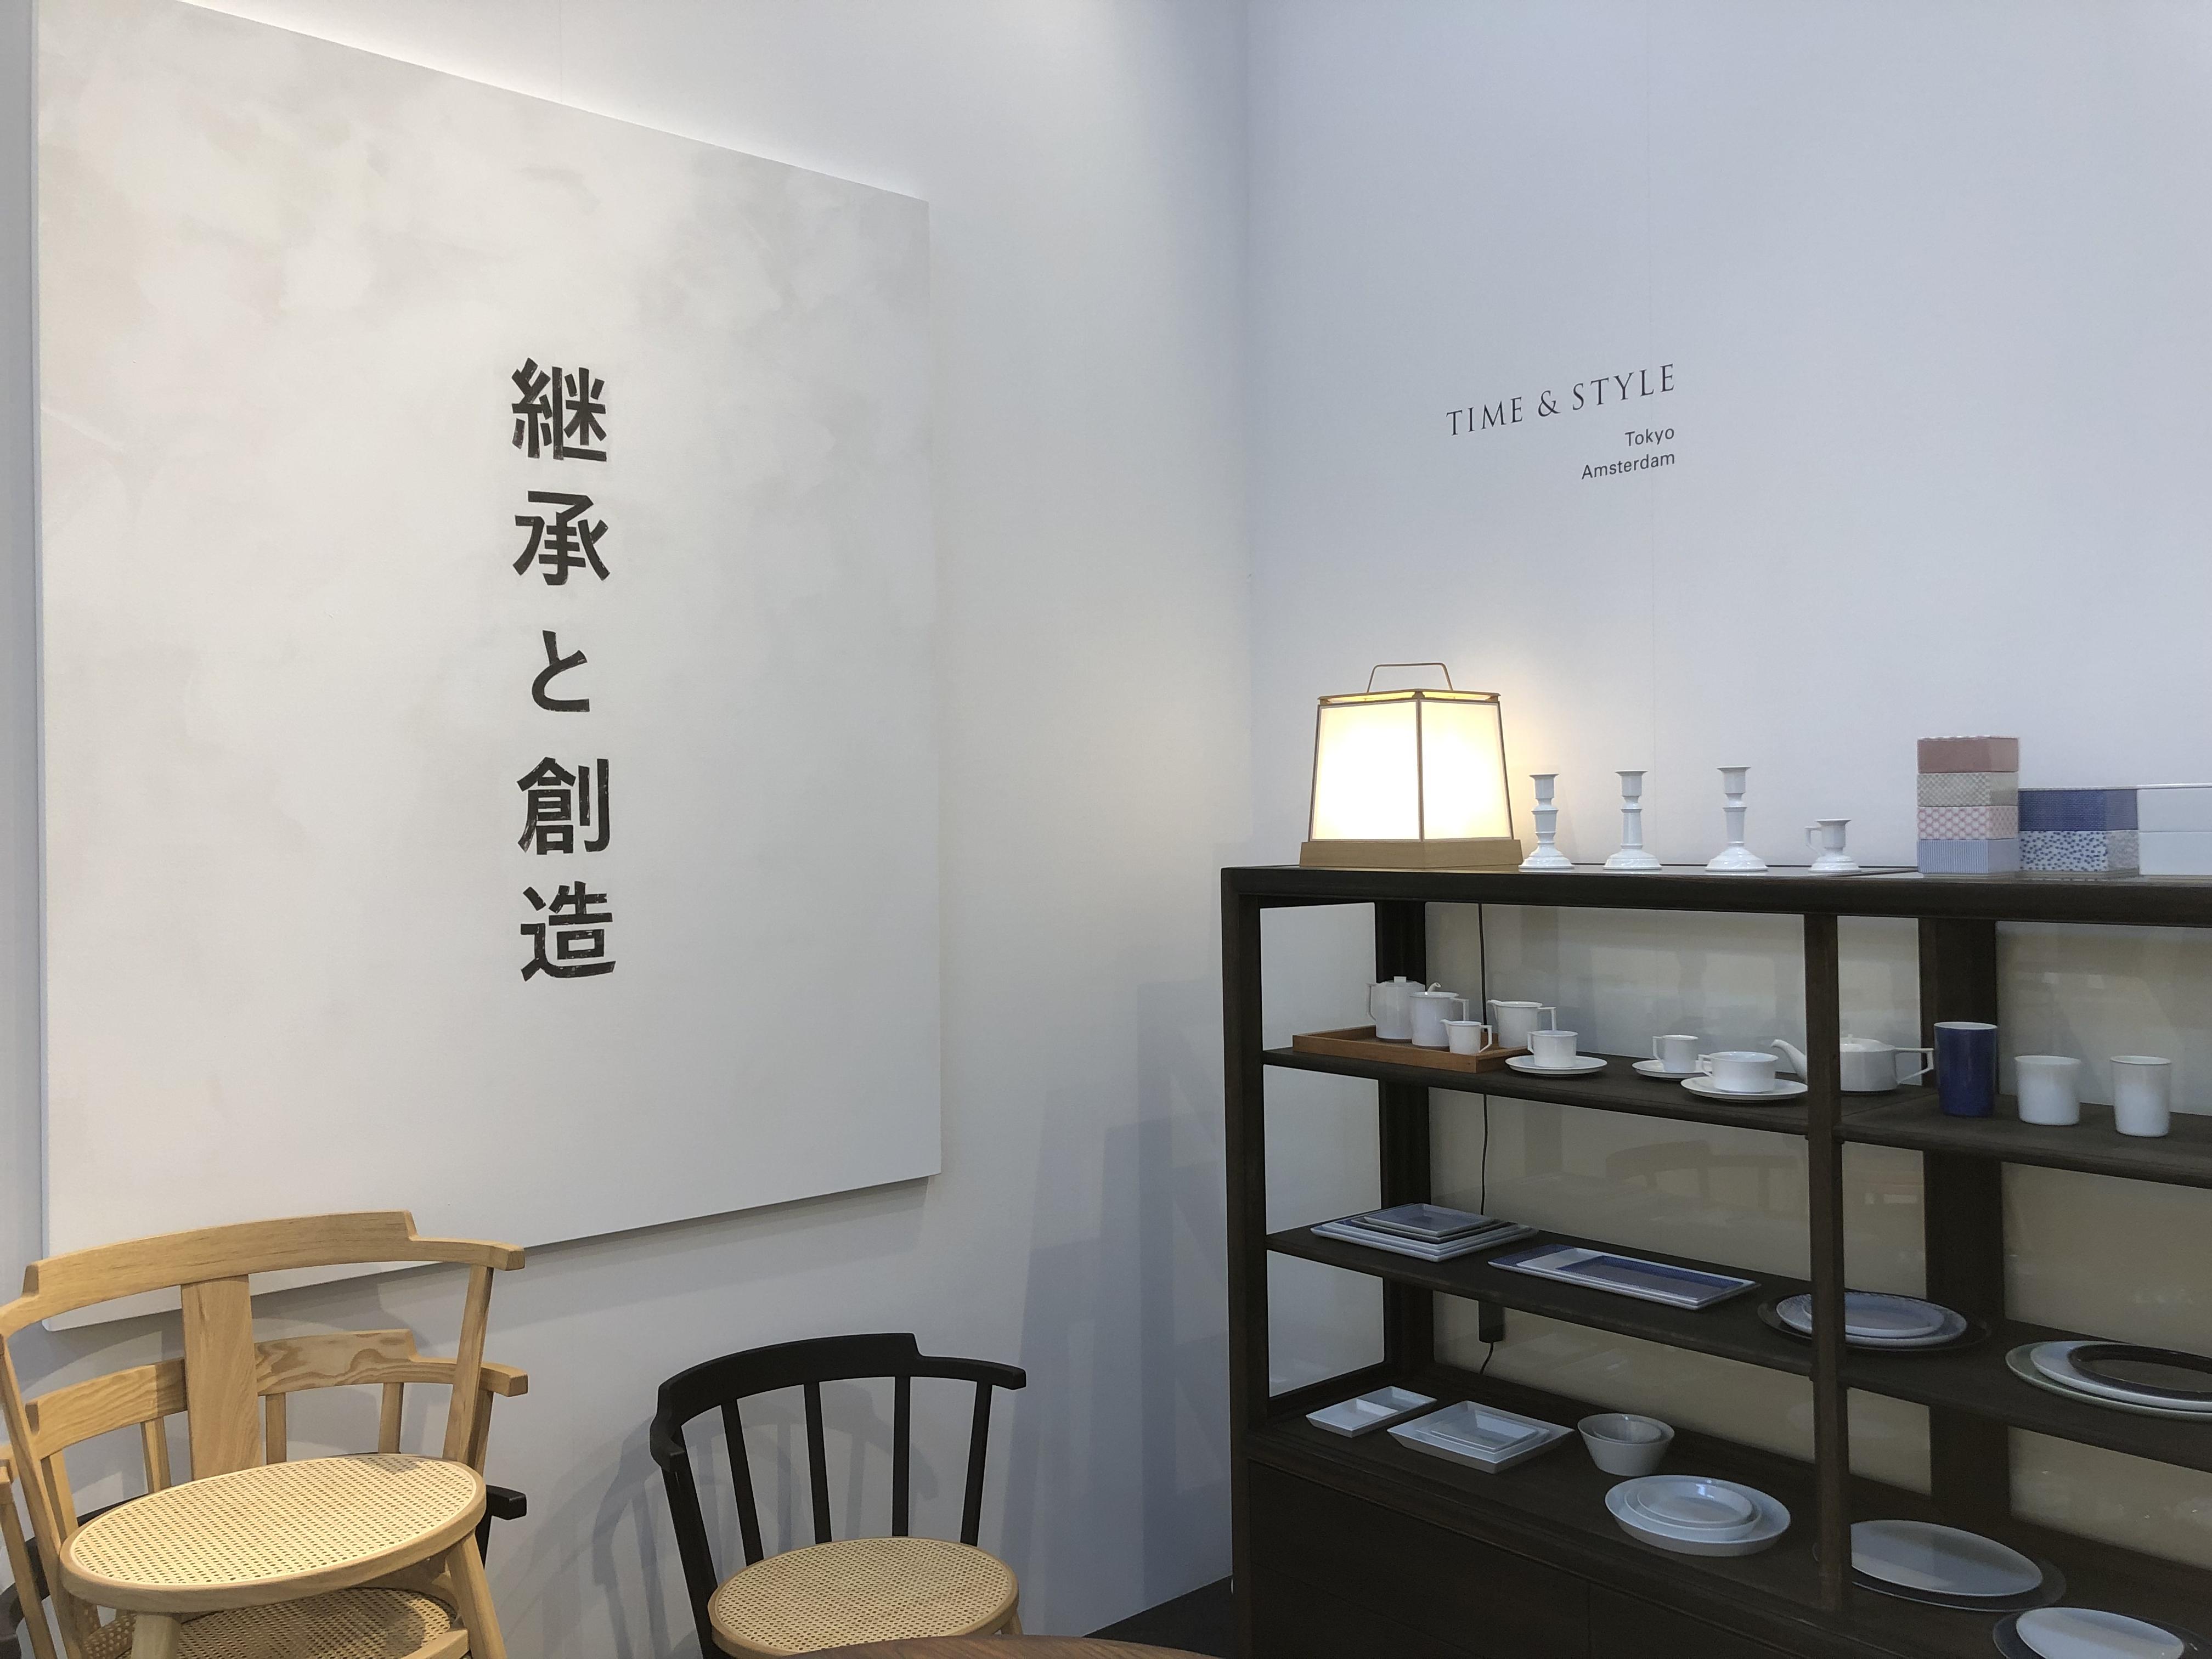 TIME & STYLE(プレステージジャパン)、アンビエンテと同時期に開催されていたストックホルムファニチャーフェアに日本企業として初出展し大きな話題を呼んだ、アンビエンテでは見本市の特性に合わせてテーブルウェアを中心に展示